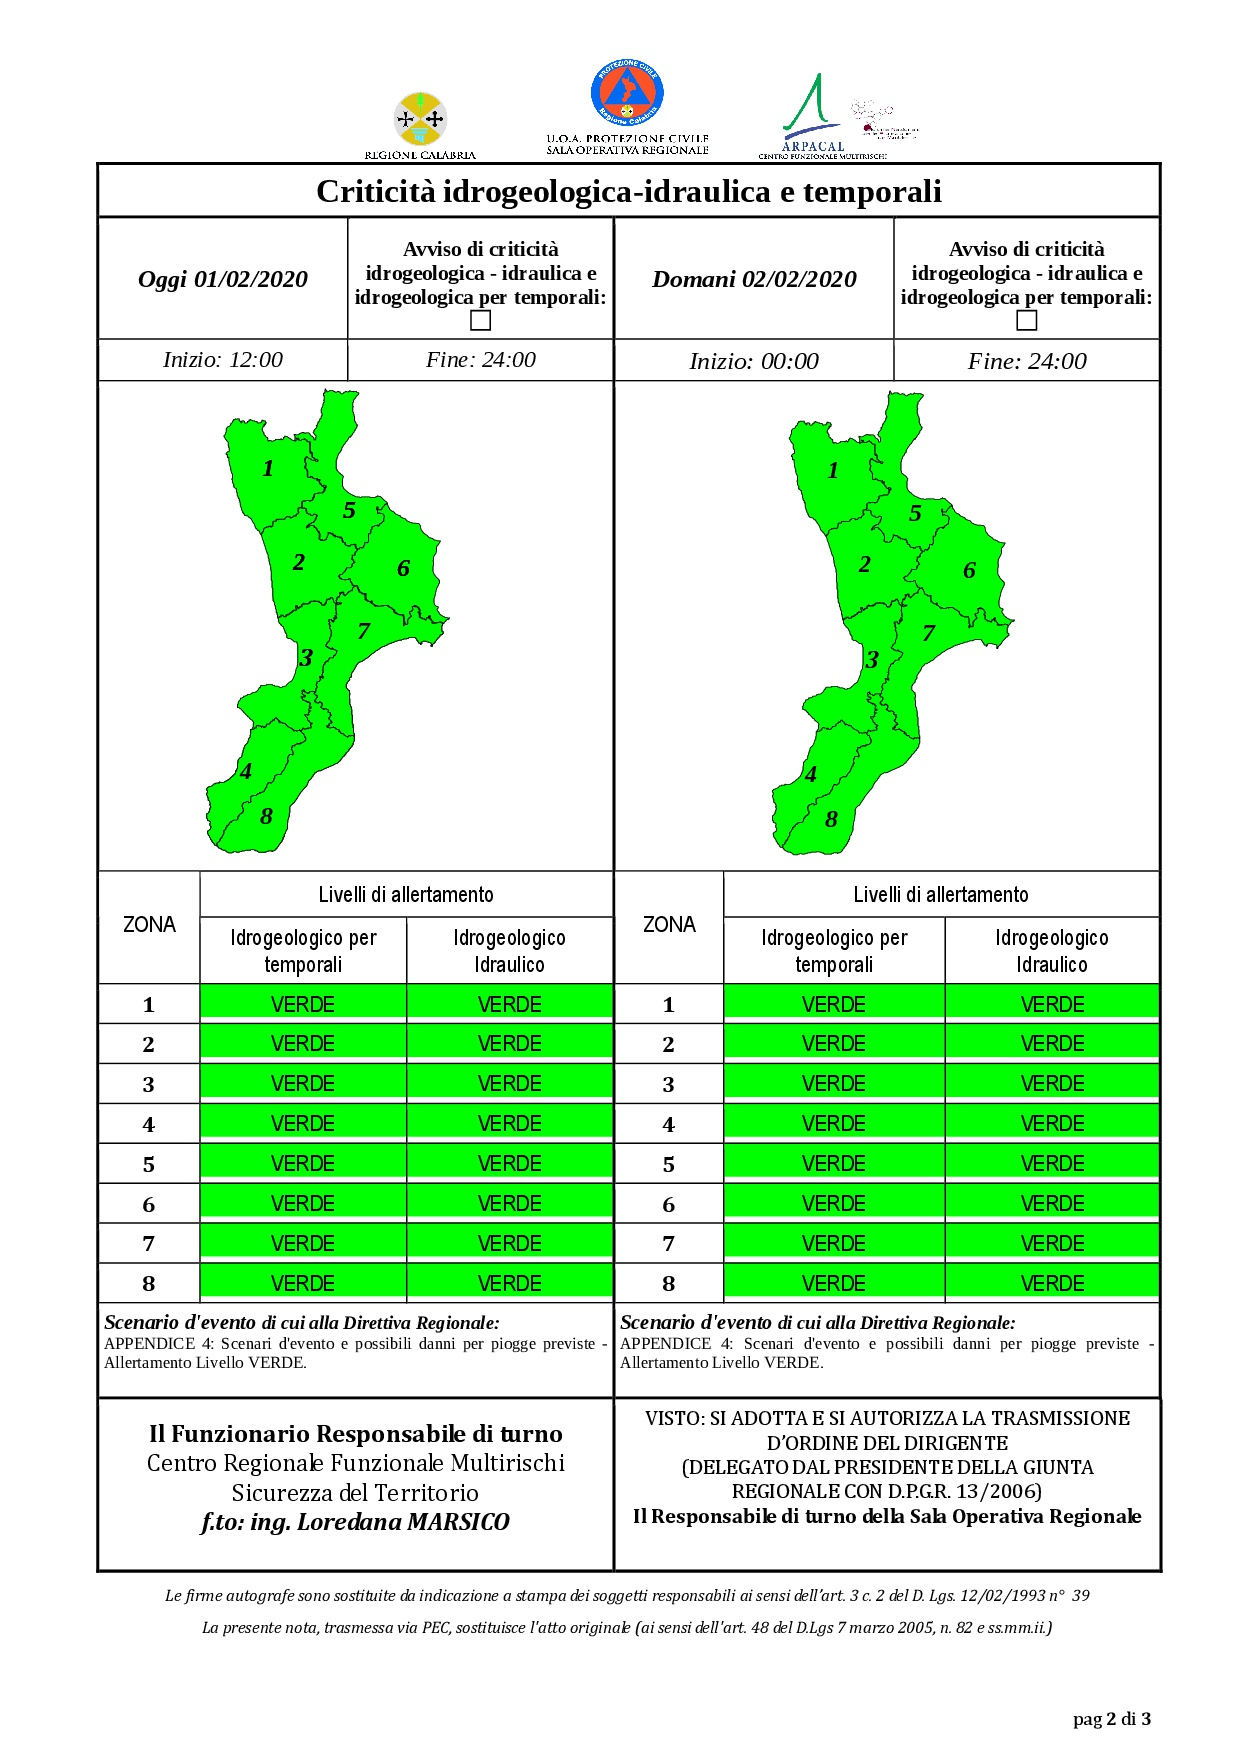 Criticità idrogeologica-idraulica e temporali in Calabria 01-02-2020